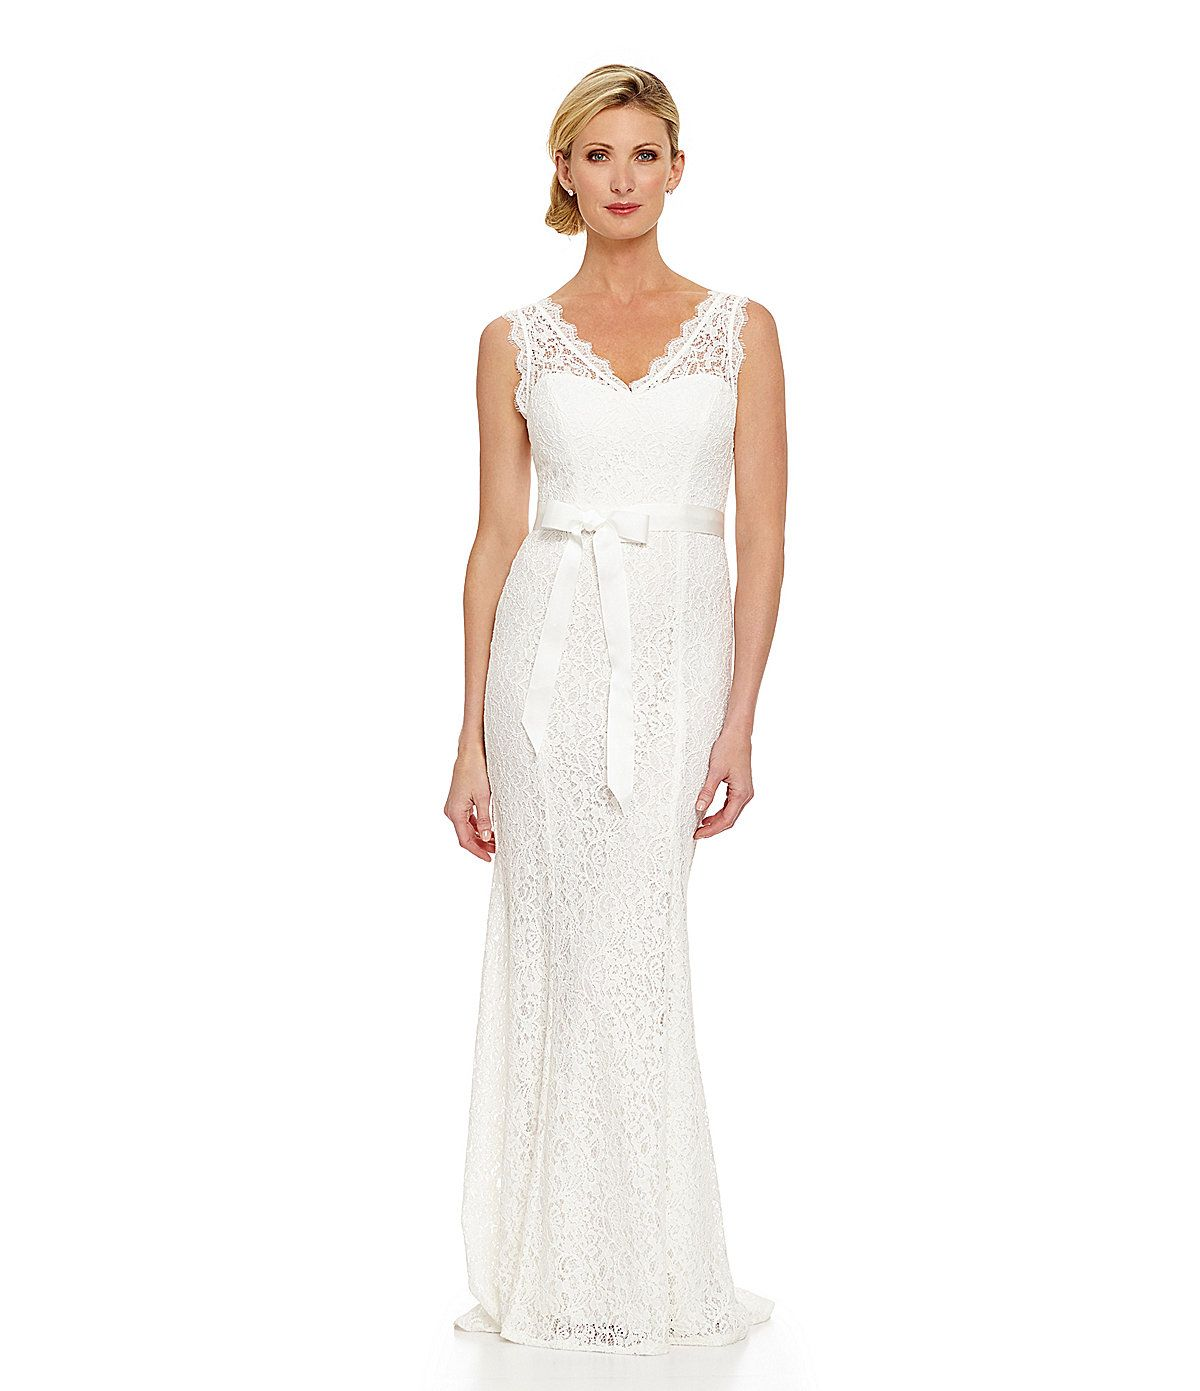 $220 at Dillard\'s. Adrianna Papell Sleeveless Lace Gown | Dillards ...